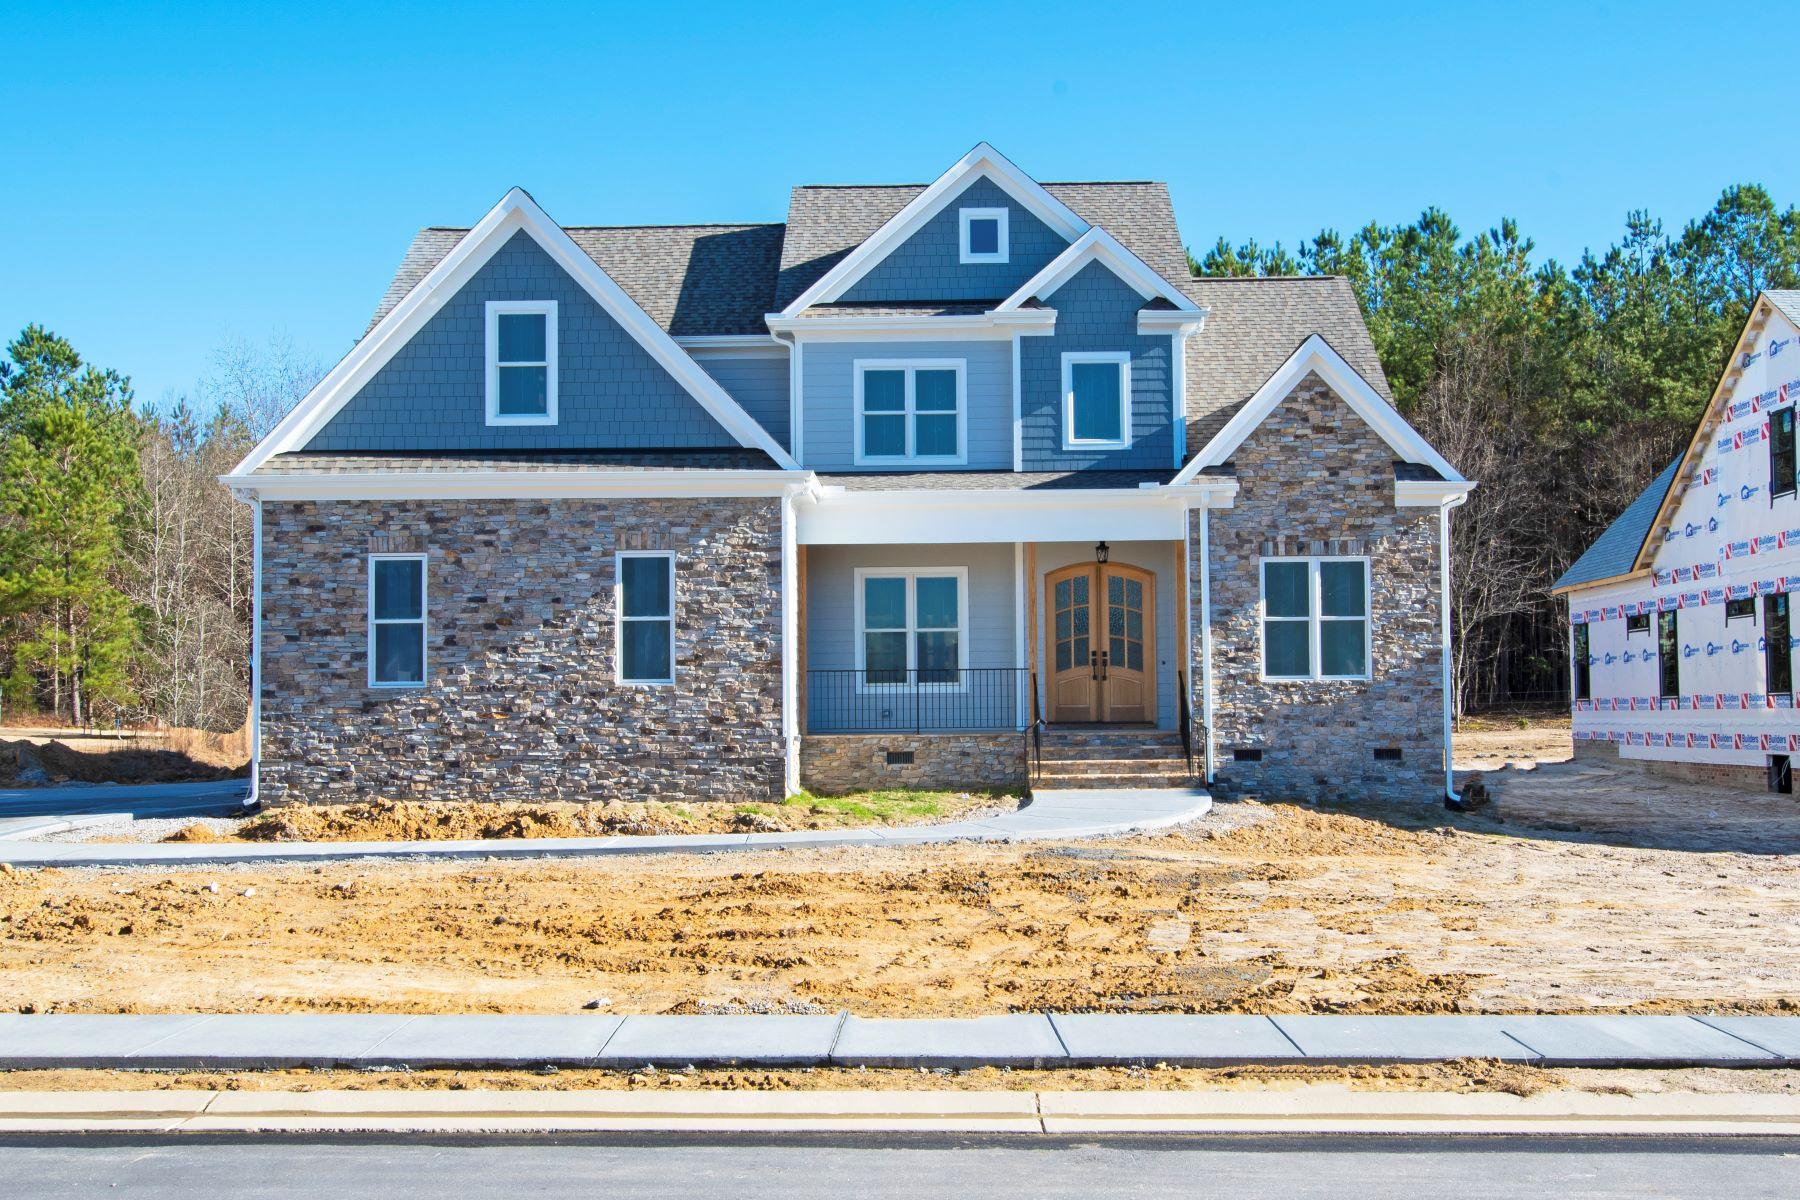 Single Family Homes for Sale at 920 Flash Drive - Averette Ridge 920 Flash Drive Rolesville, North Carolina 27571 United States